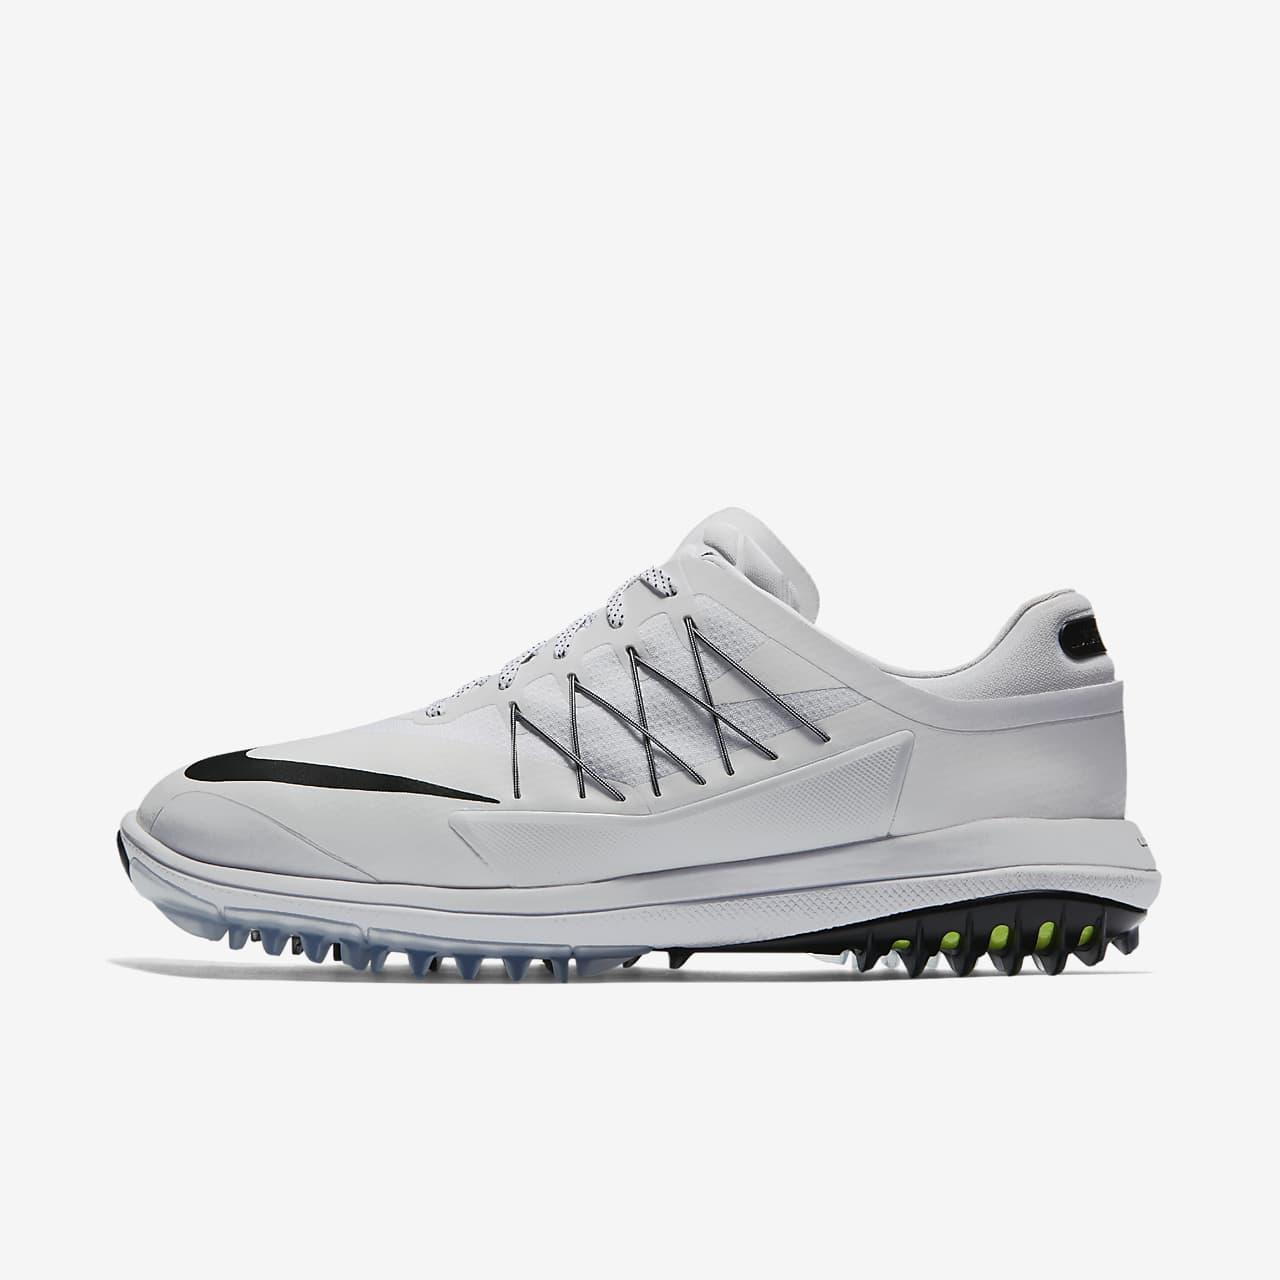 Nike Lunar Control Vapor (Wide) Men's Golf Shoe